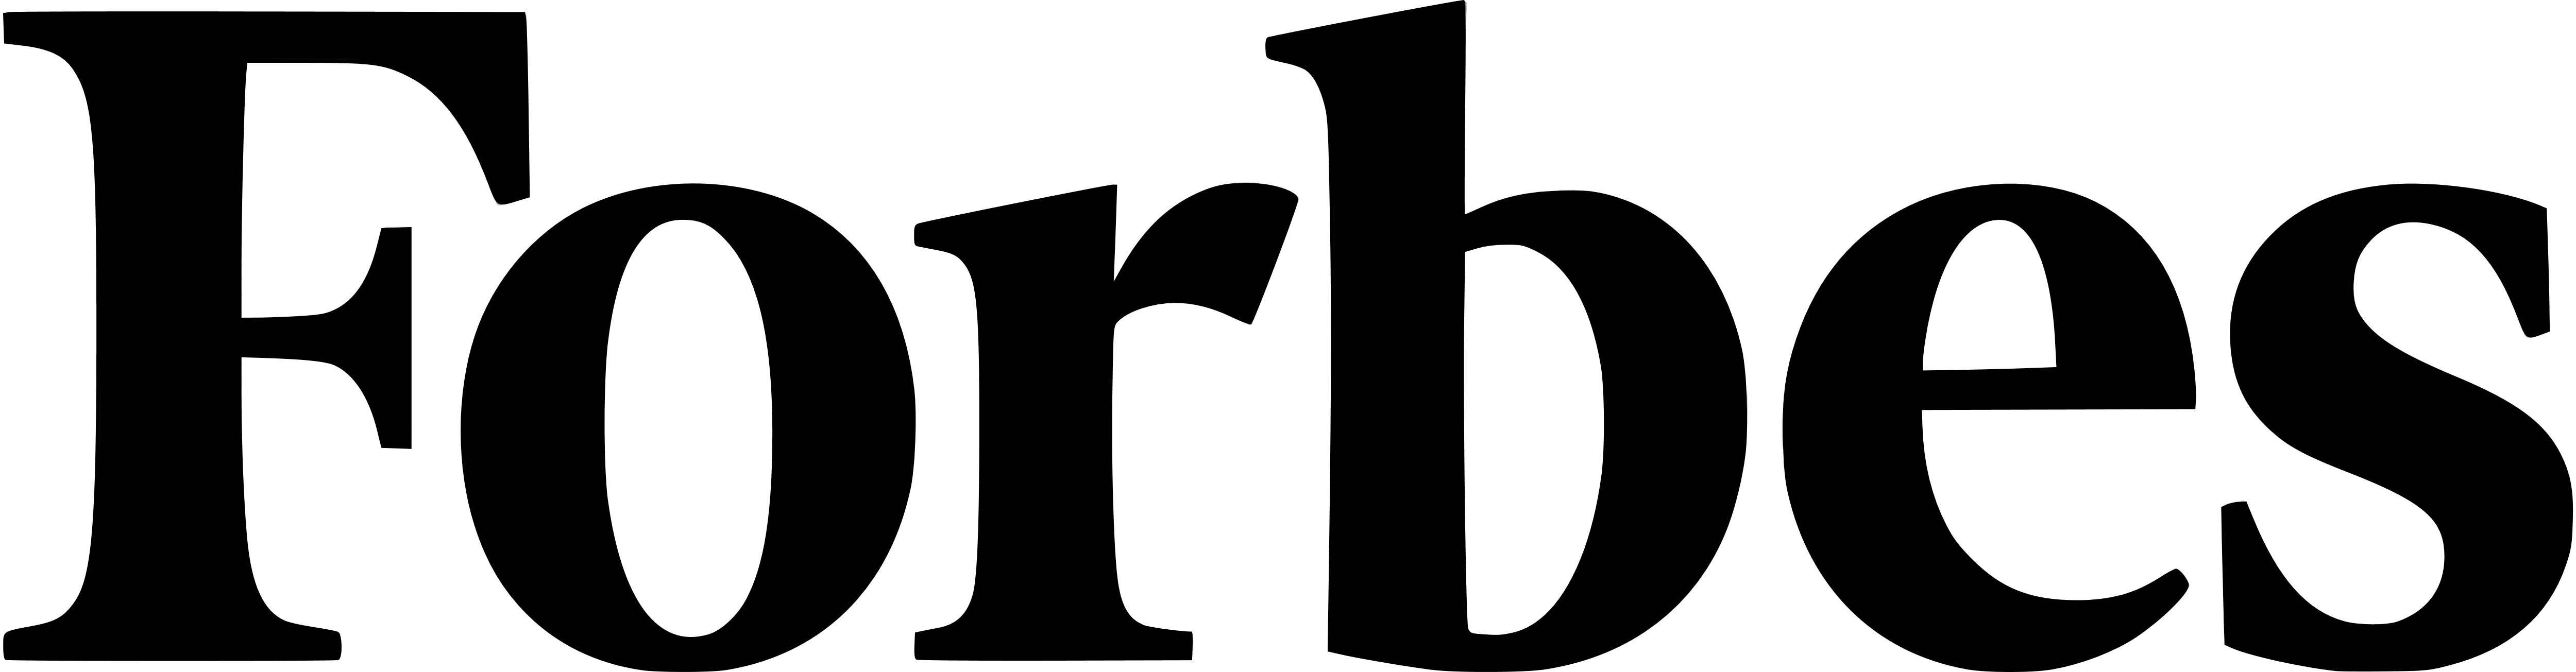 https://sabrinaphilipp.com/wp-content/uploads/2018/02/Forbes_logo_black.png